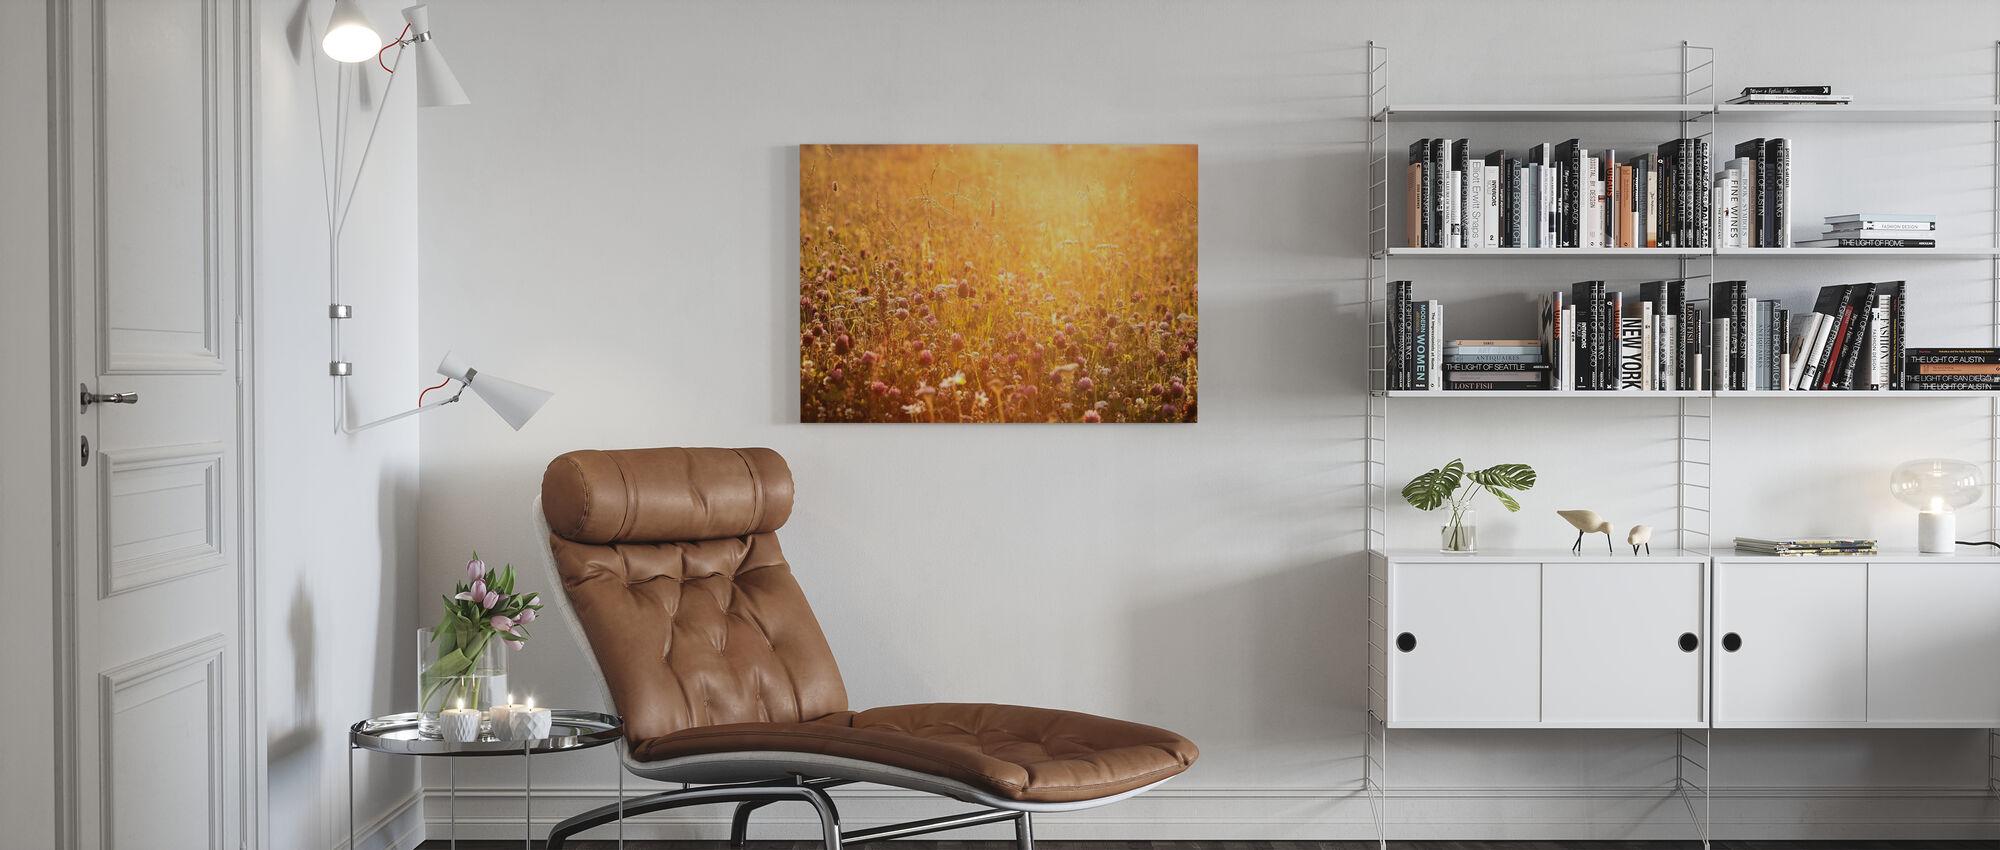 Evening Clover - Canvas print - Living Room